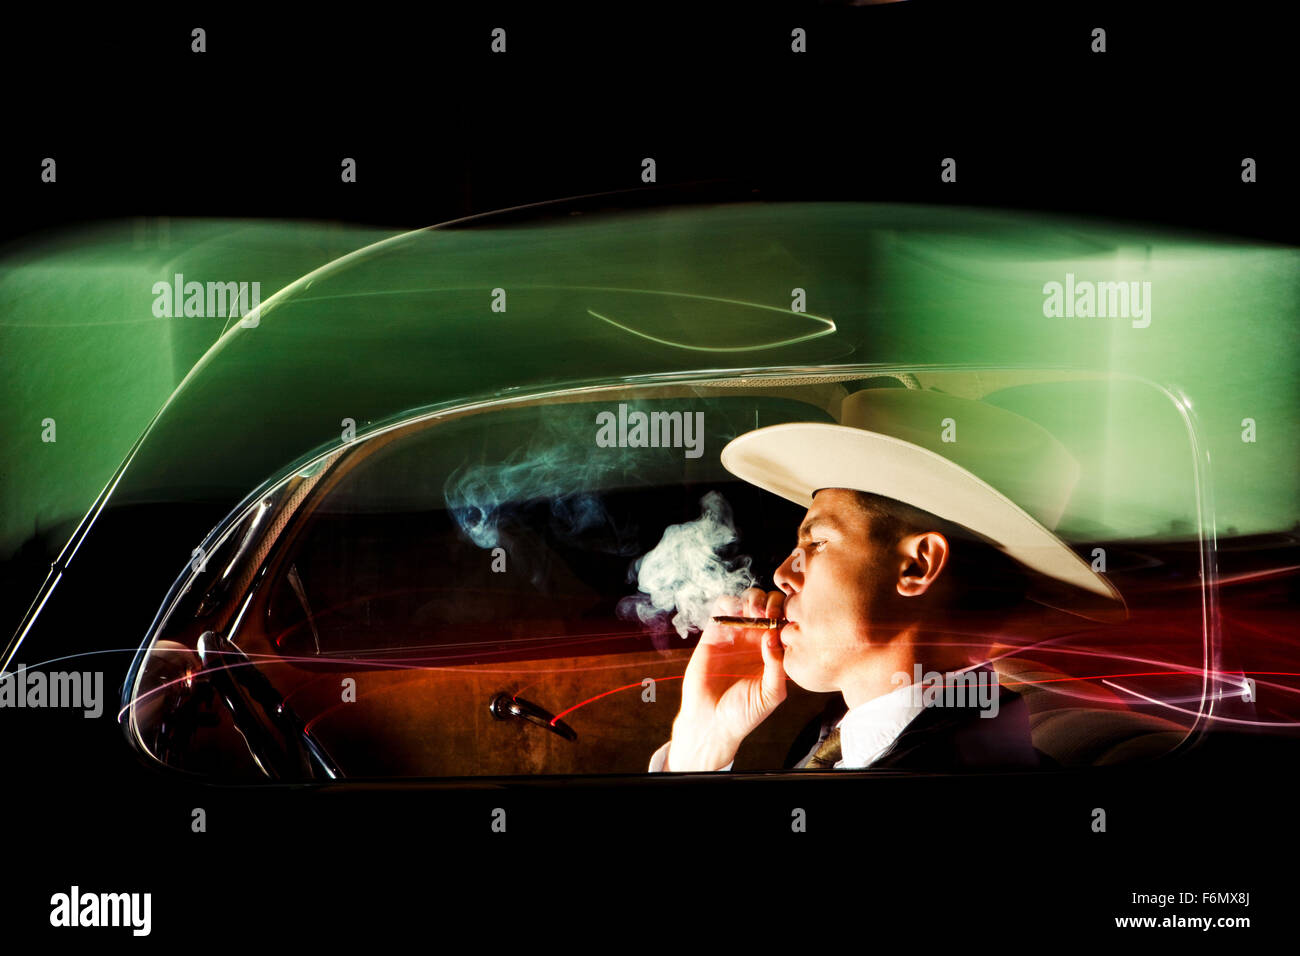 June 18, 2010. MOVIE TITLE: The Killer Inside Me. STUDIO: IFC Films. PLOT: A West Texas deputy sheriff is slowly - Stock Image